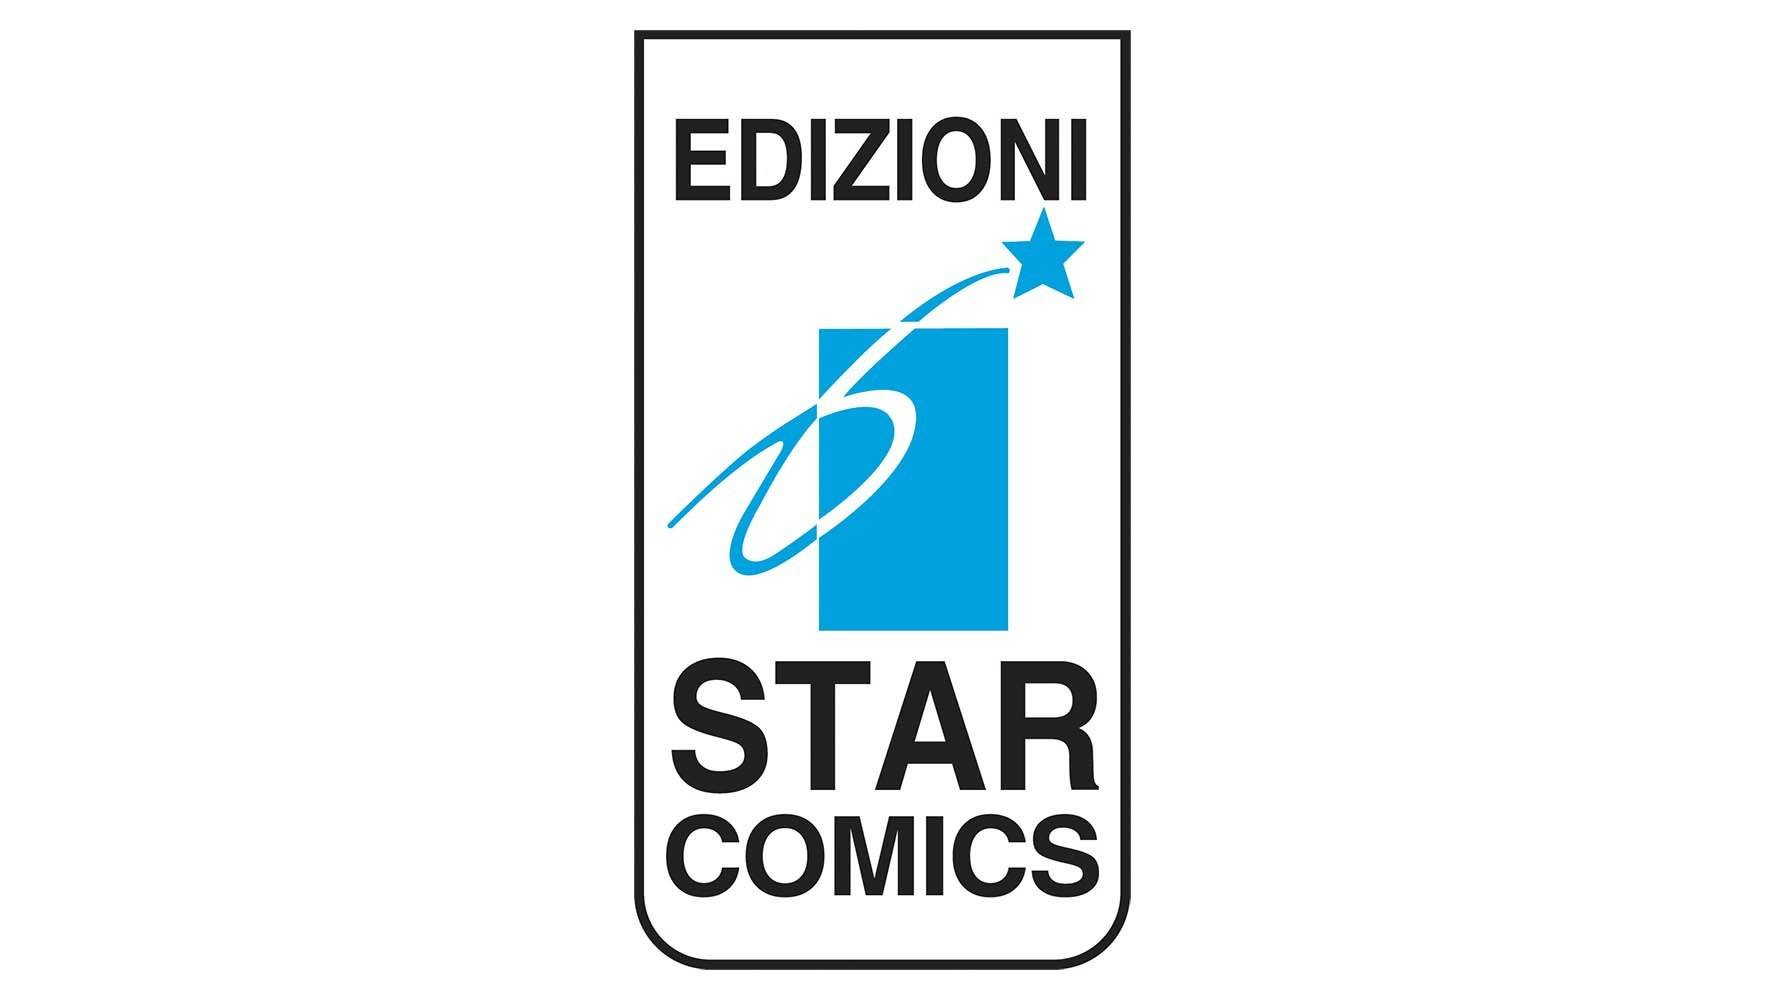 edizioni_star_comics_copertina